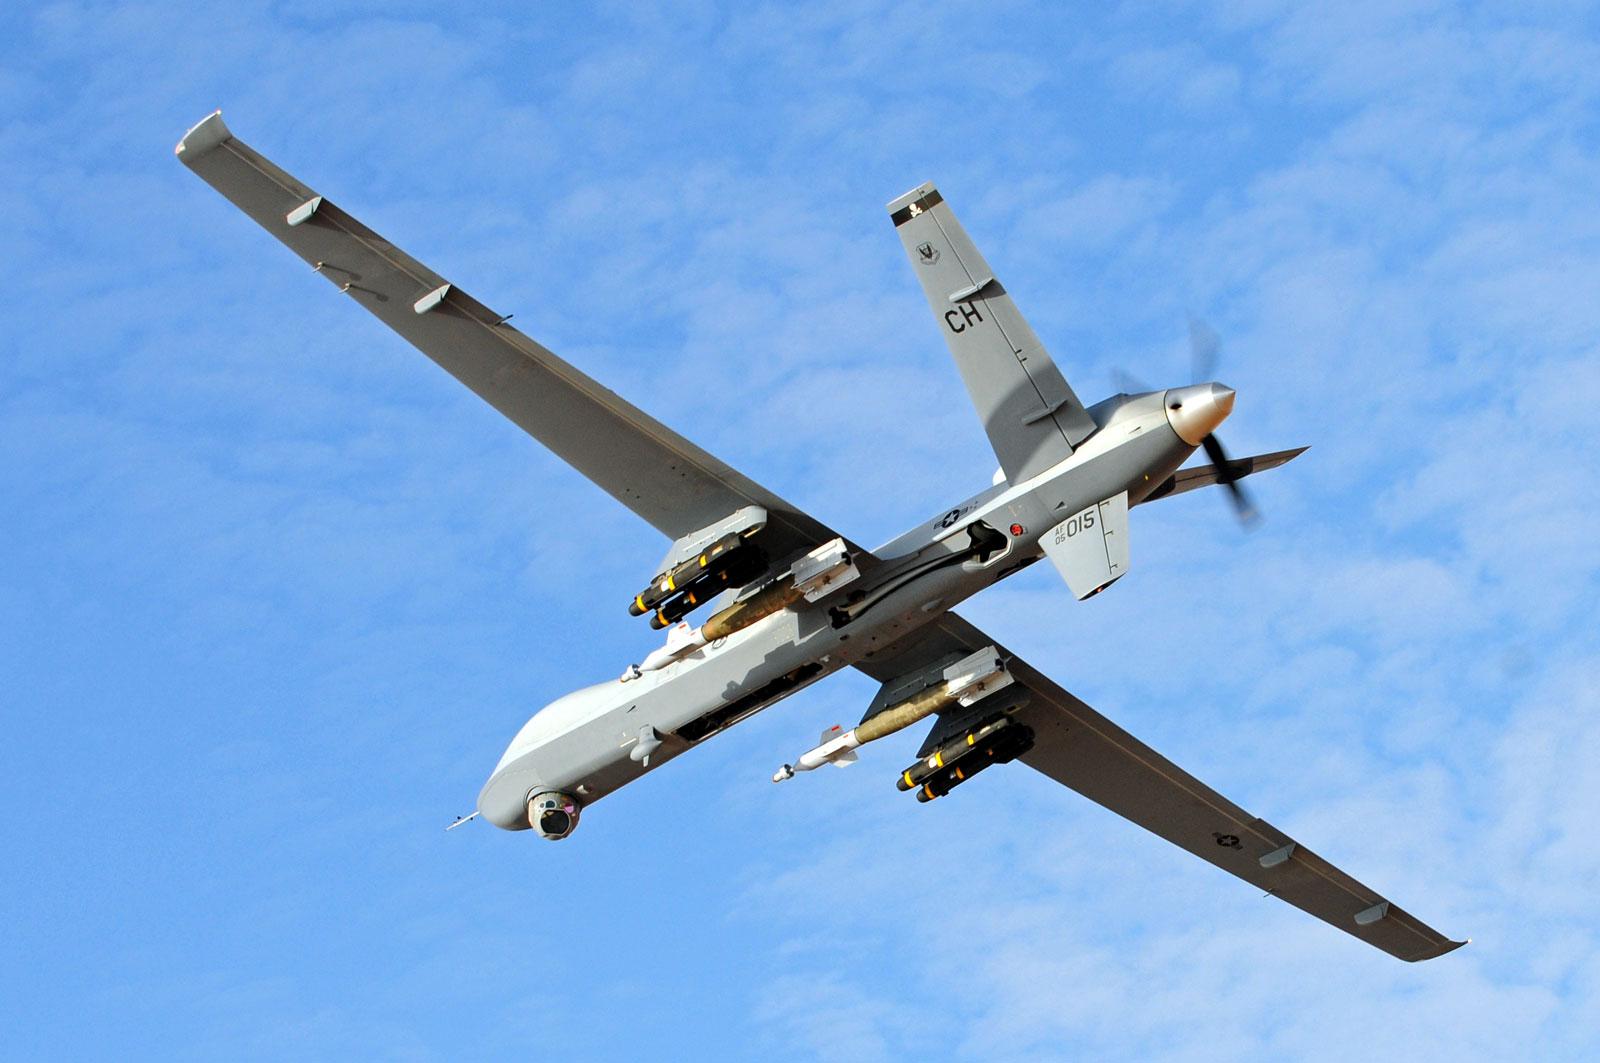 General Atomics MQ-1C Grey Eagle